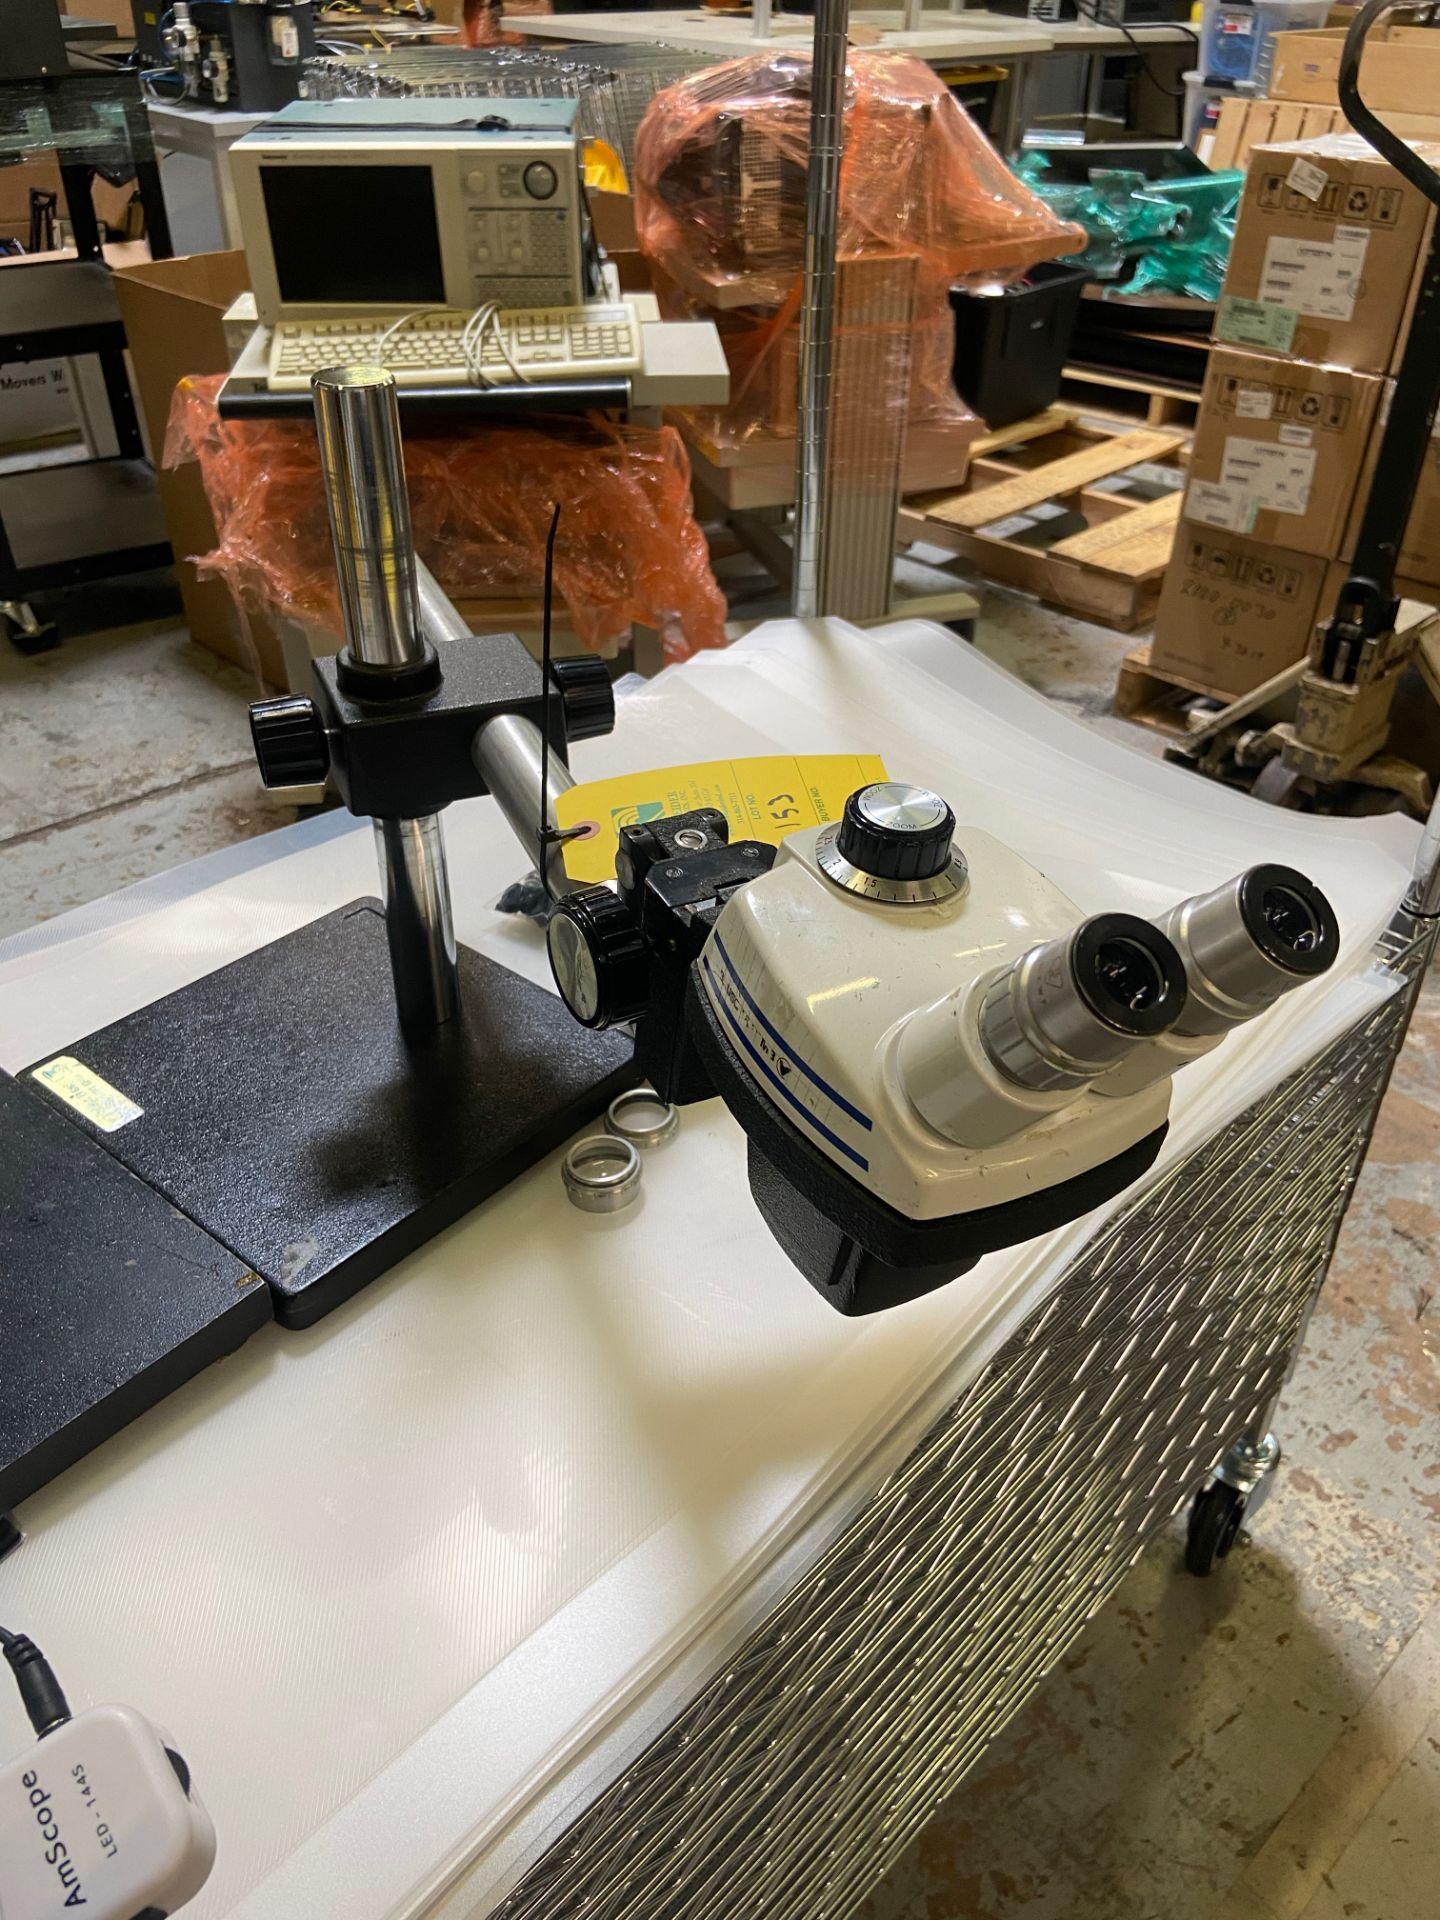 Microscope StereoZoom 4, 0.7X - 30X, Rigging Fee: $20